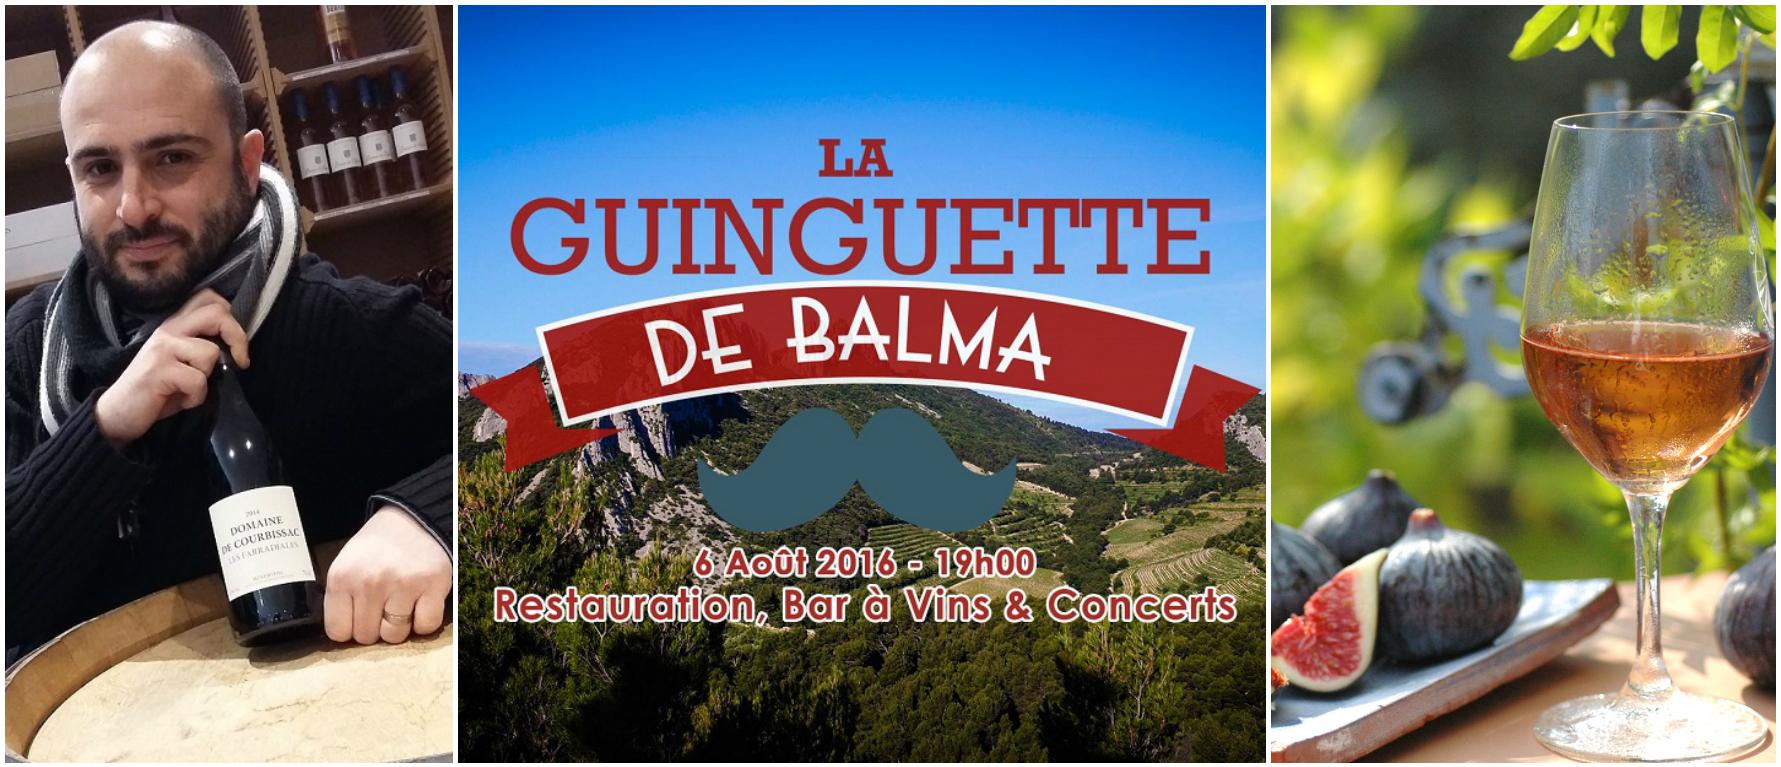 guinguette fête balma venitia Grand Pastis